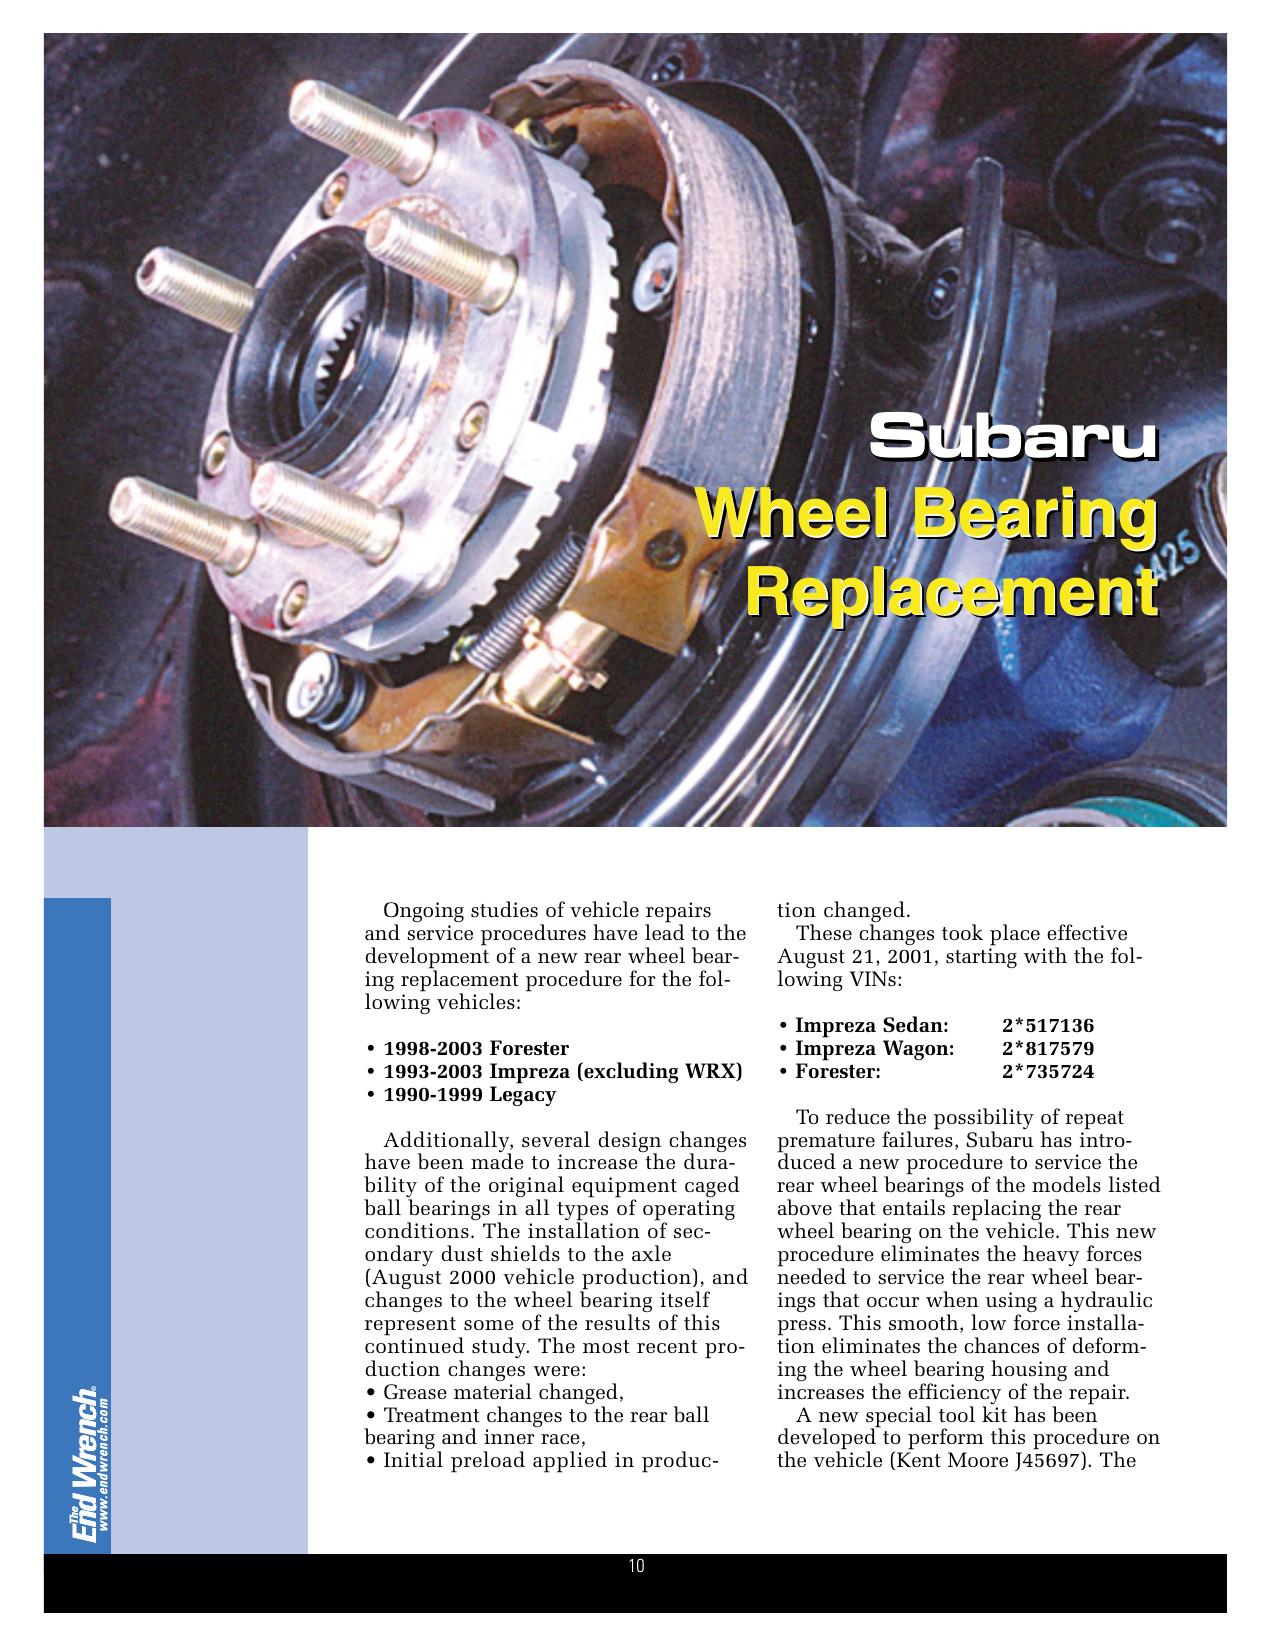 Subaru Wheel Bearing Replacement Subaru - Ludicrous